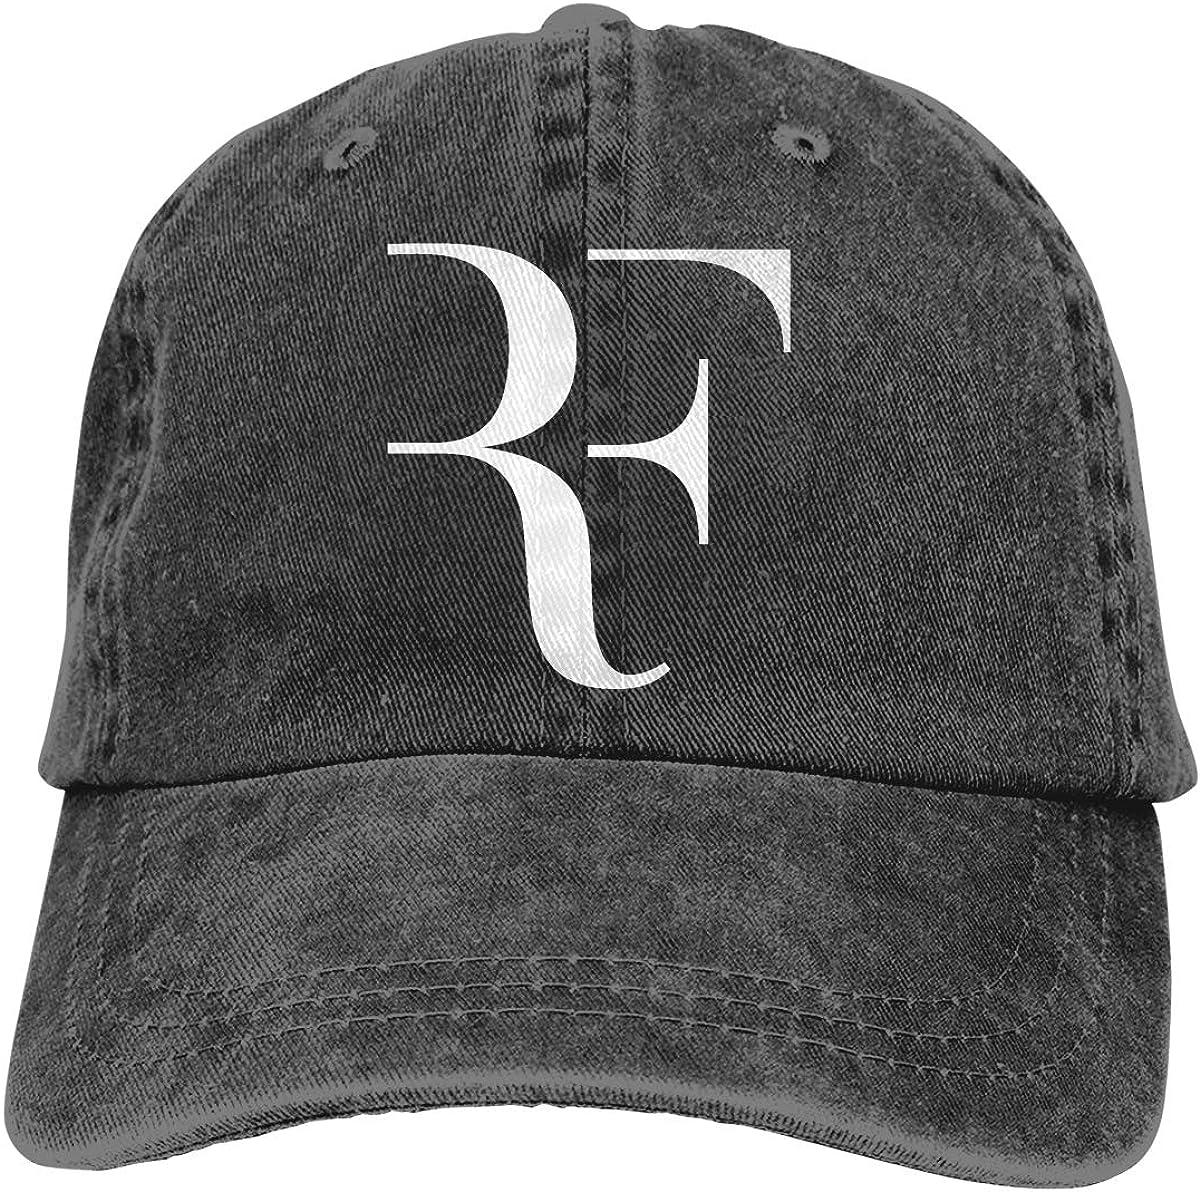 Sweetbgig Roger Federer Home Outdoor Fashion Cowboy Hat Black